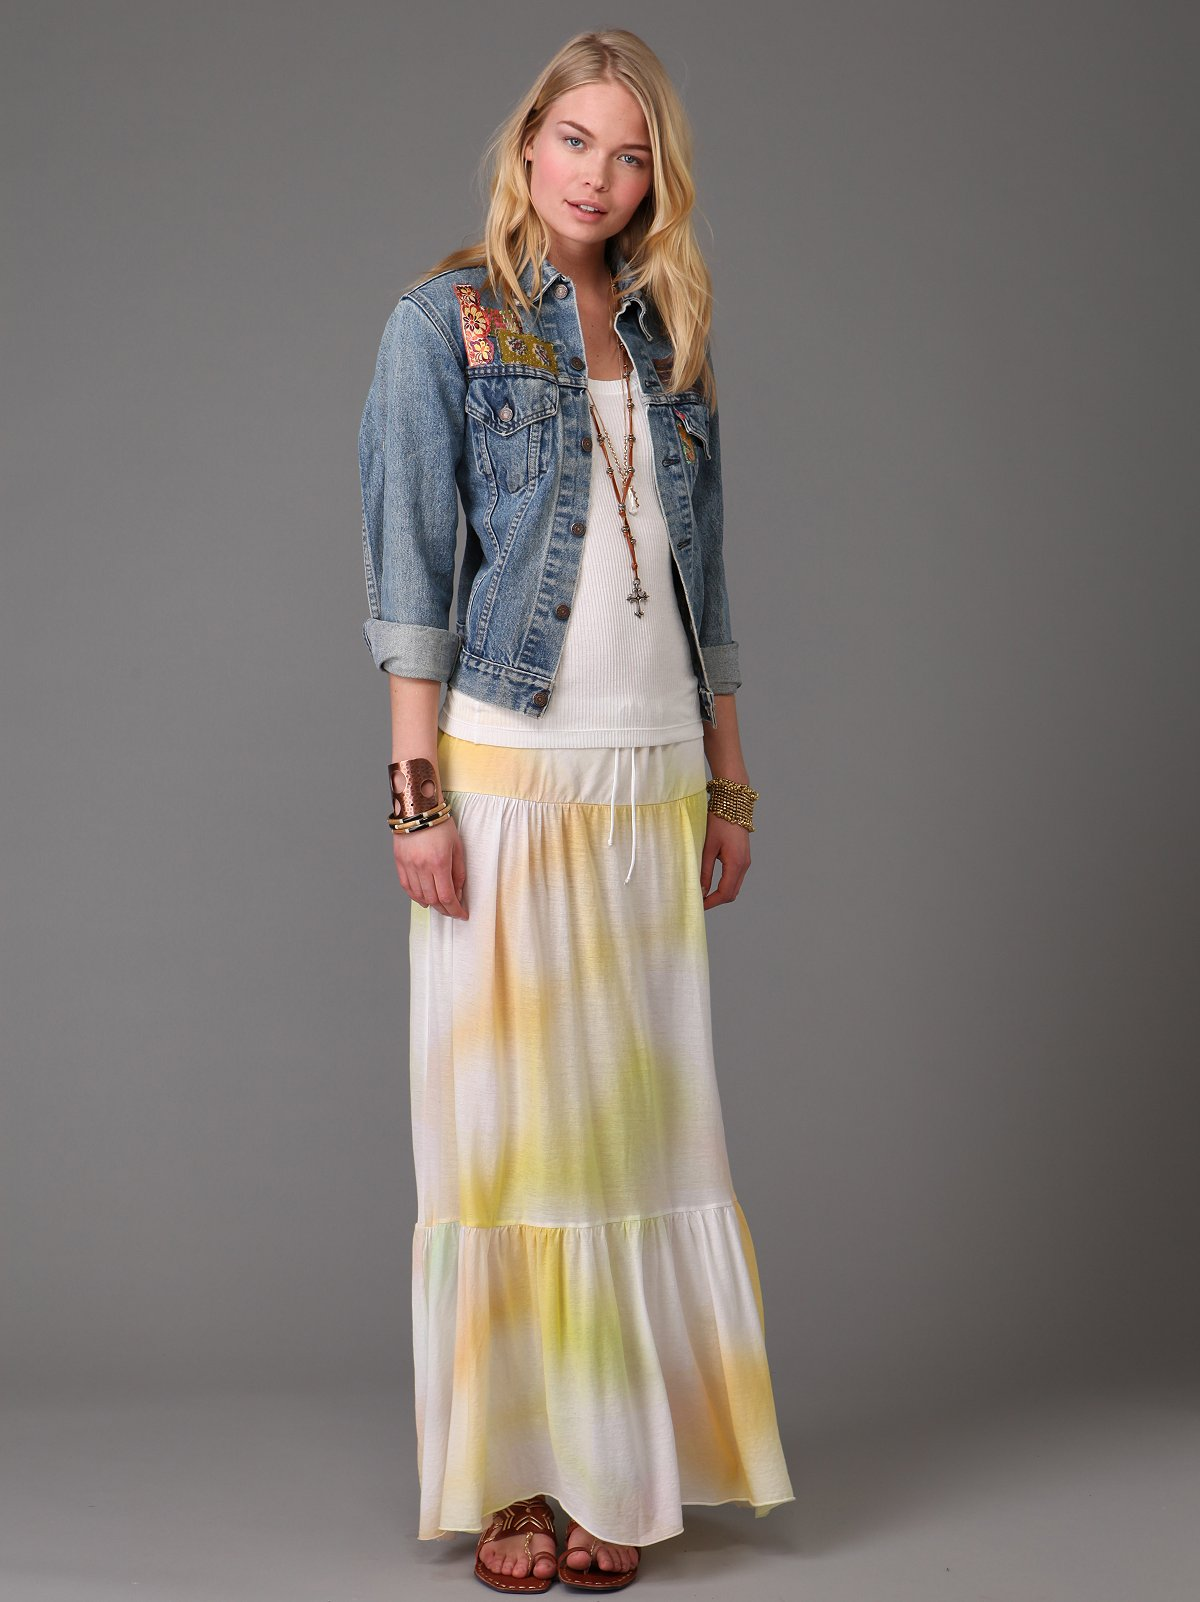 Seneca Rising Mia Skirt